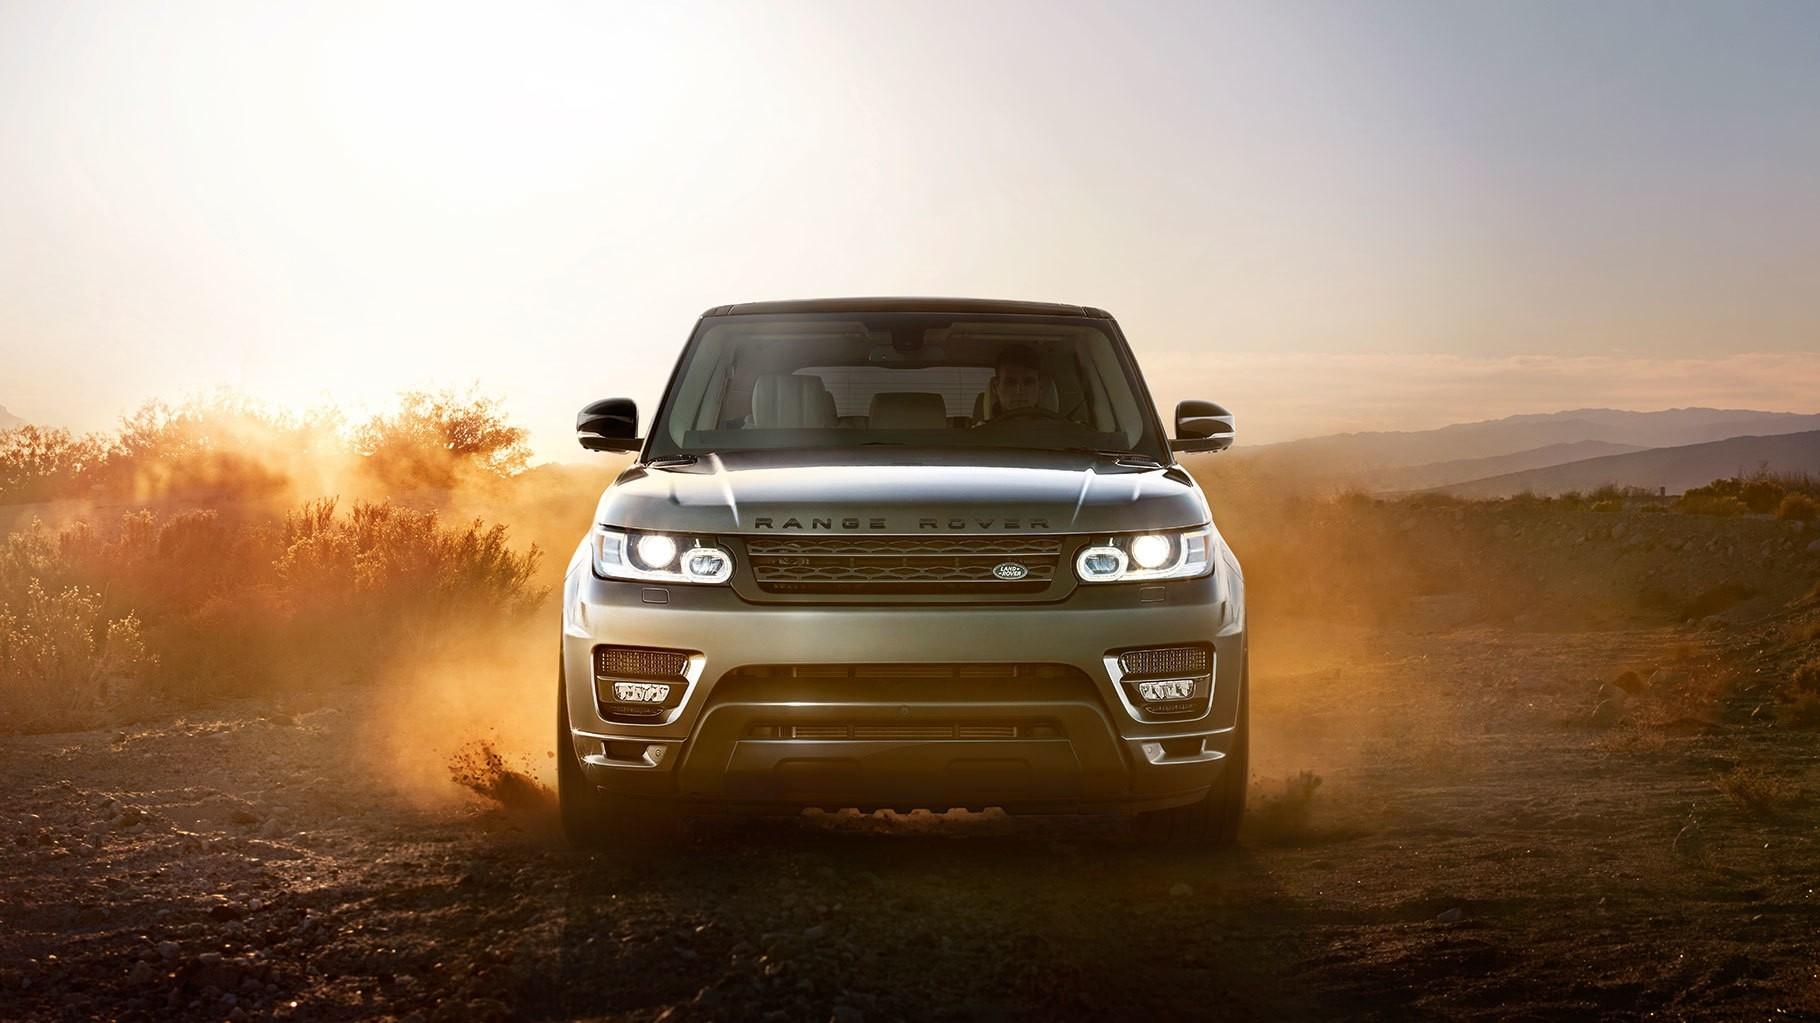 2017 Land Rover Range Rover Sport Exterior front end